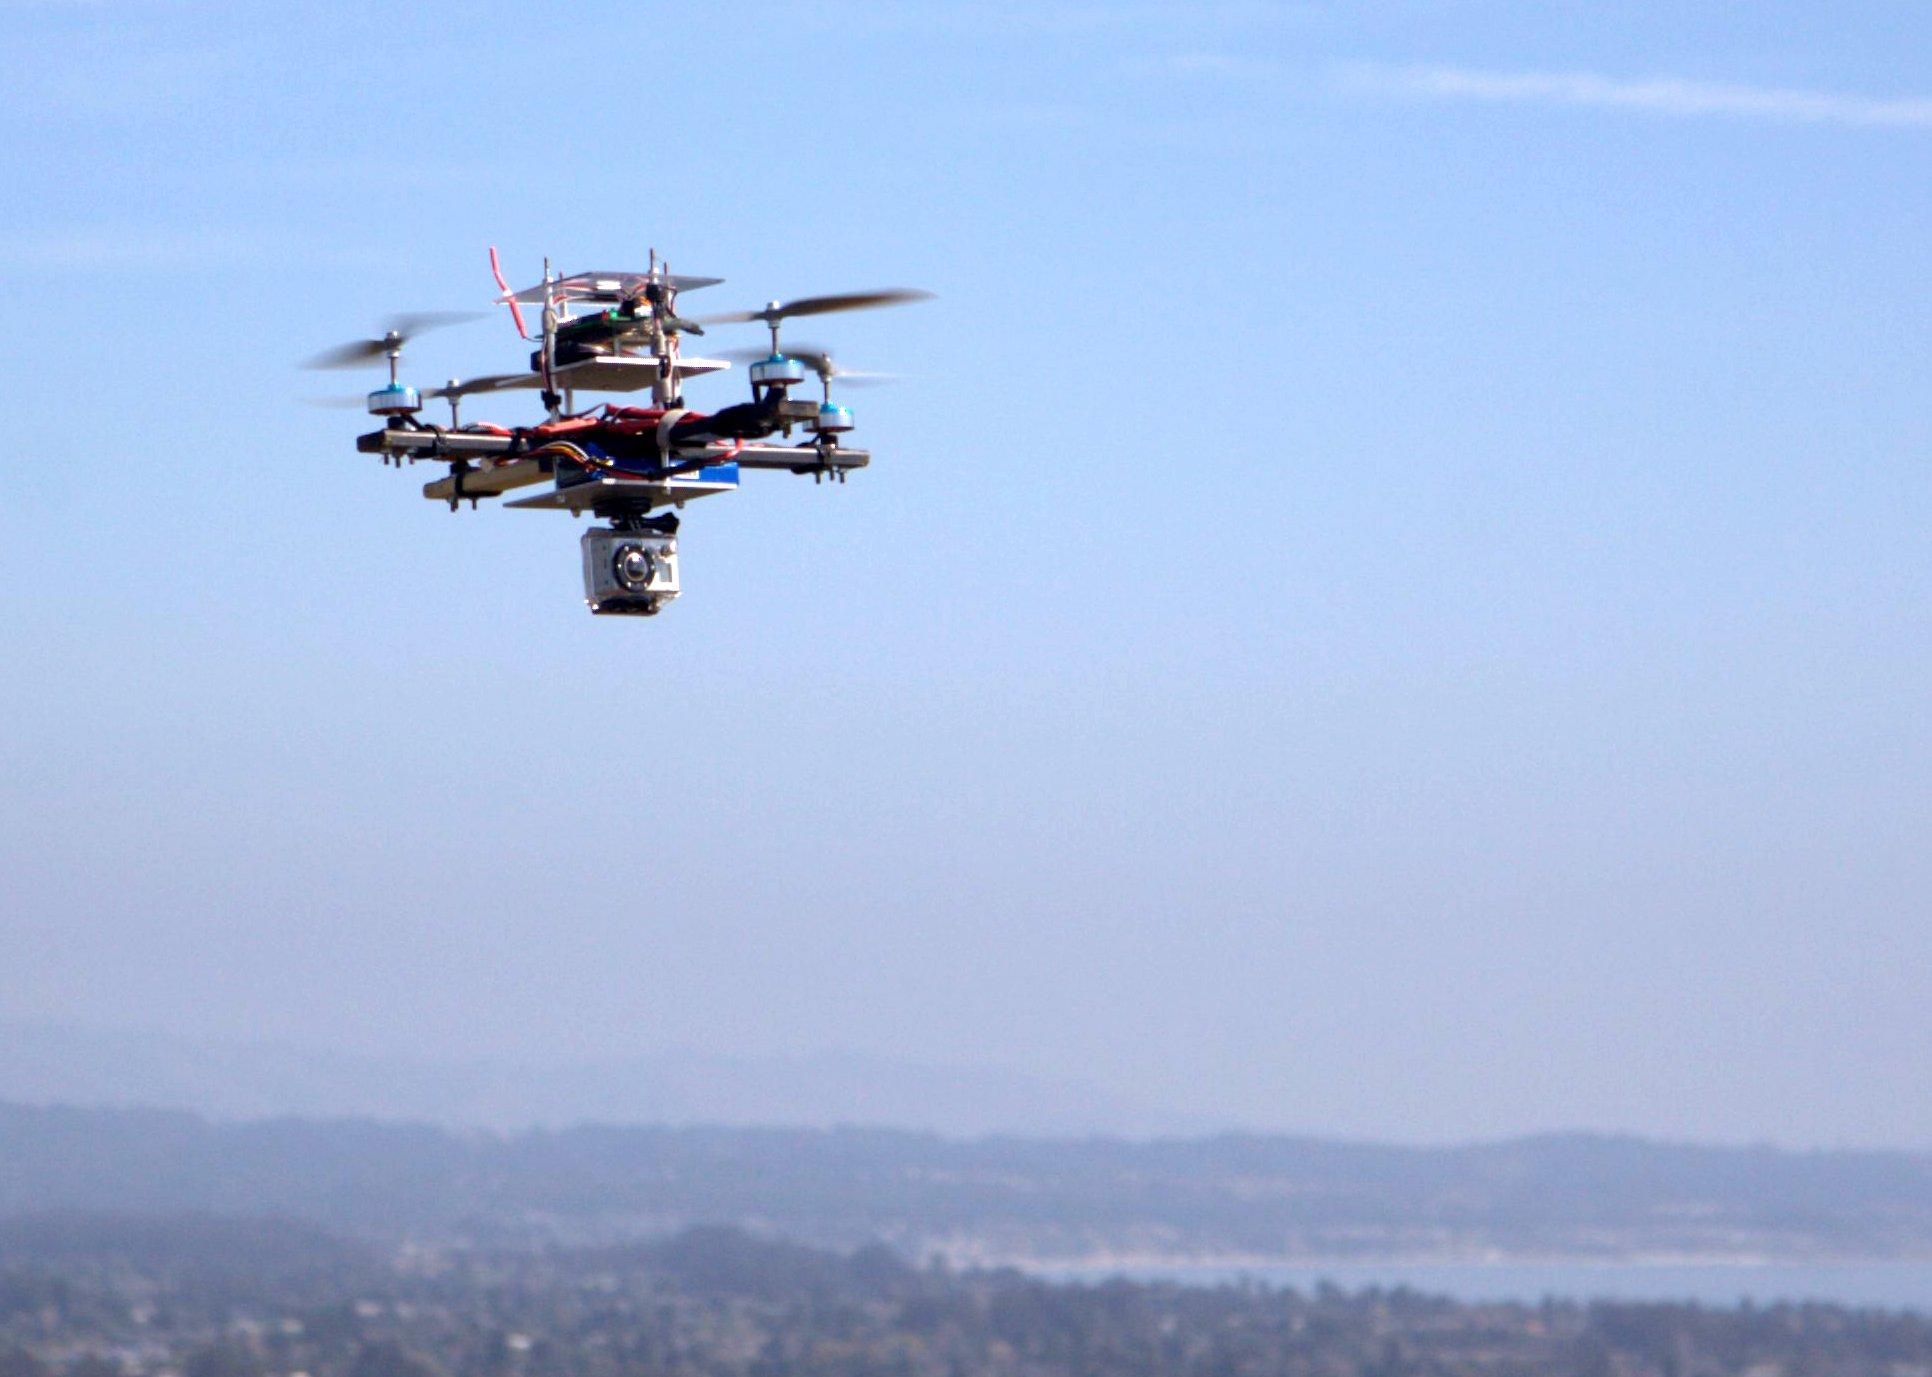 Quadcopter, quadcopter, quadcopter!